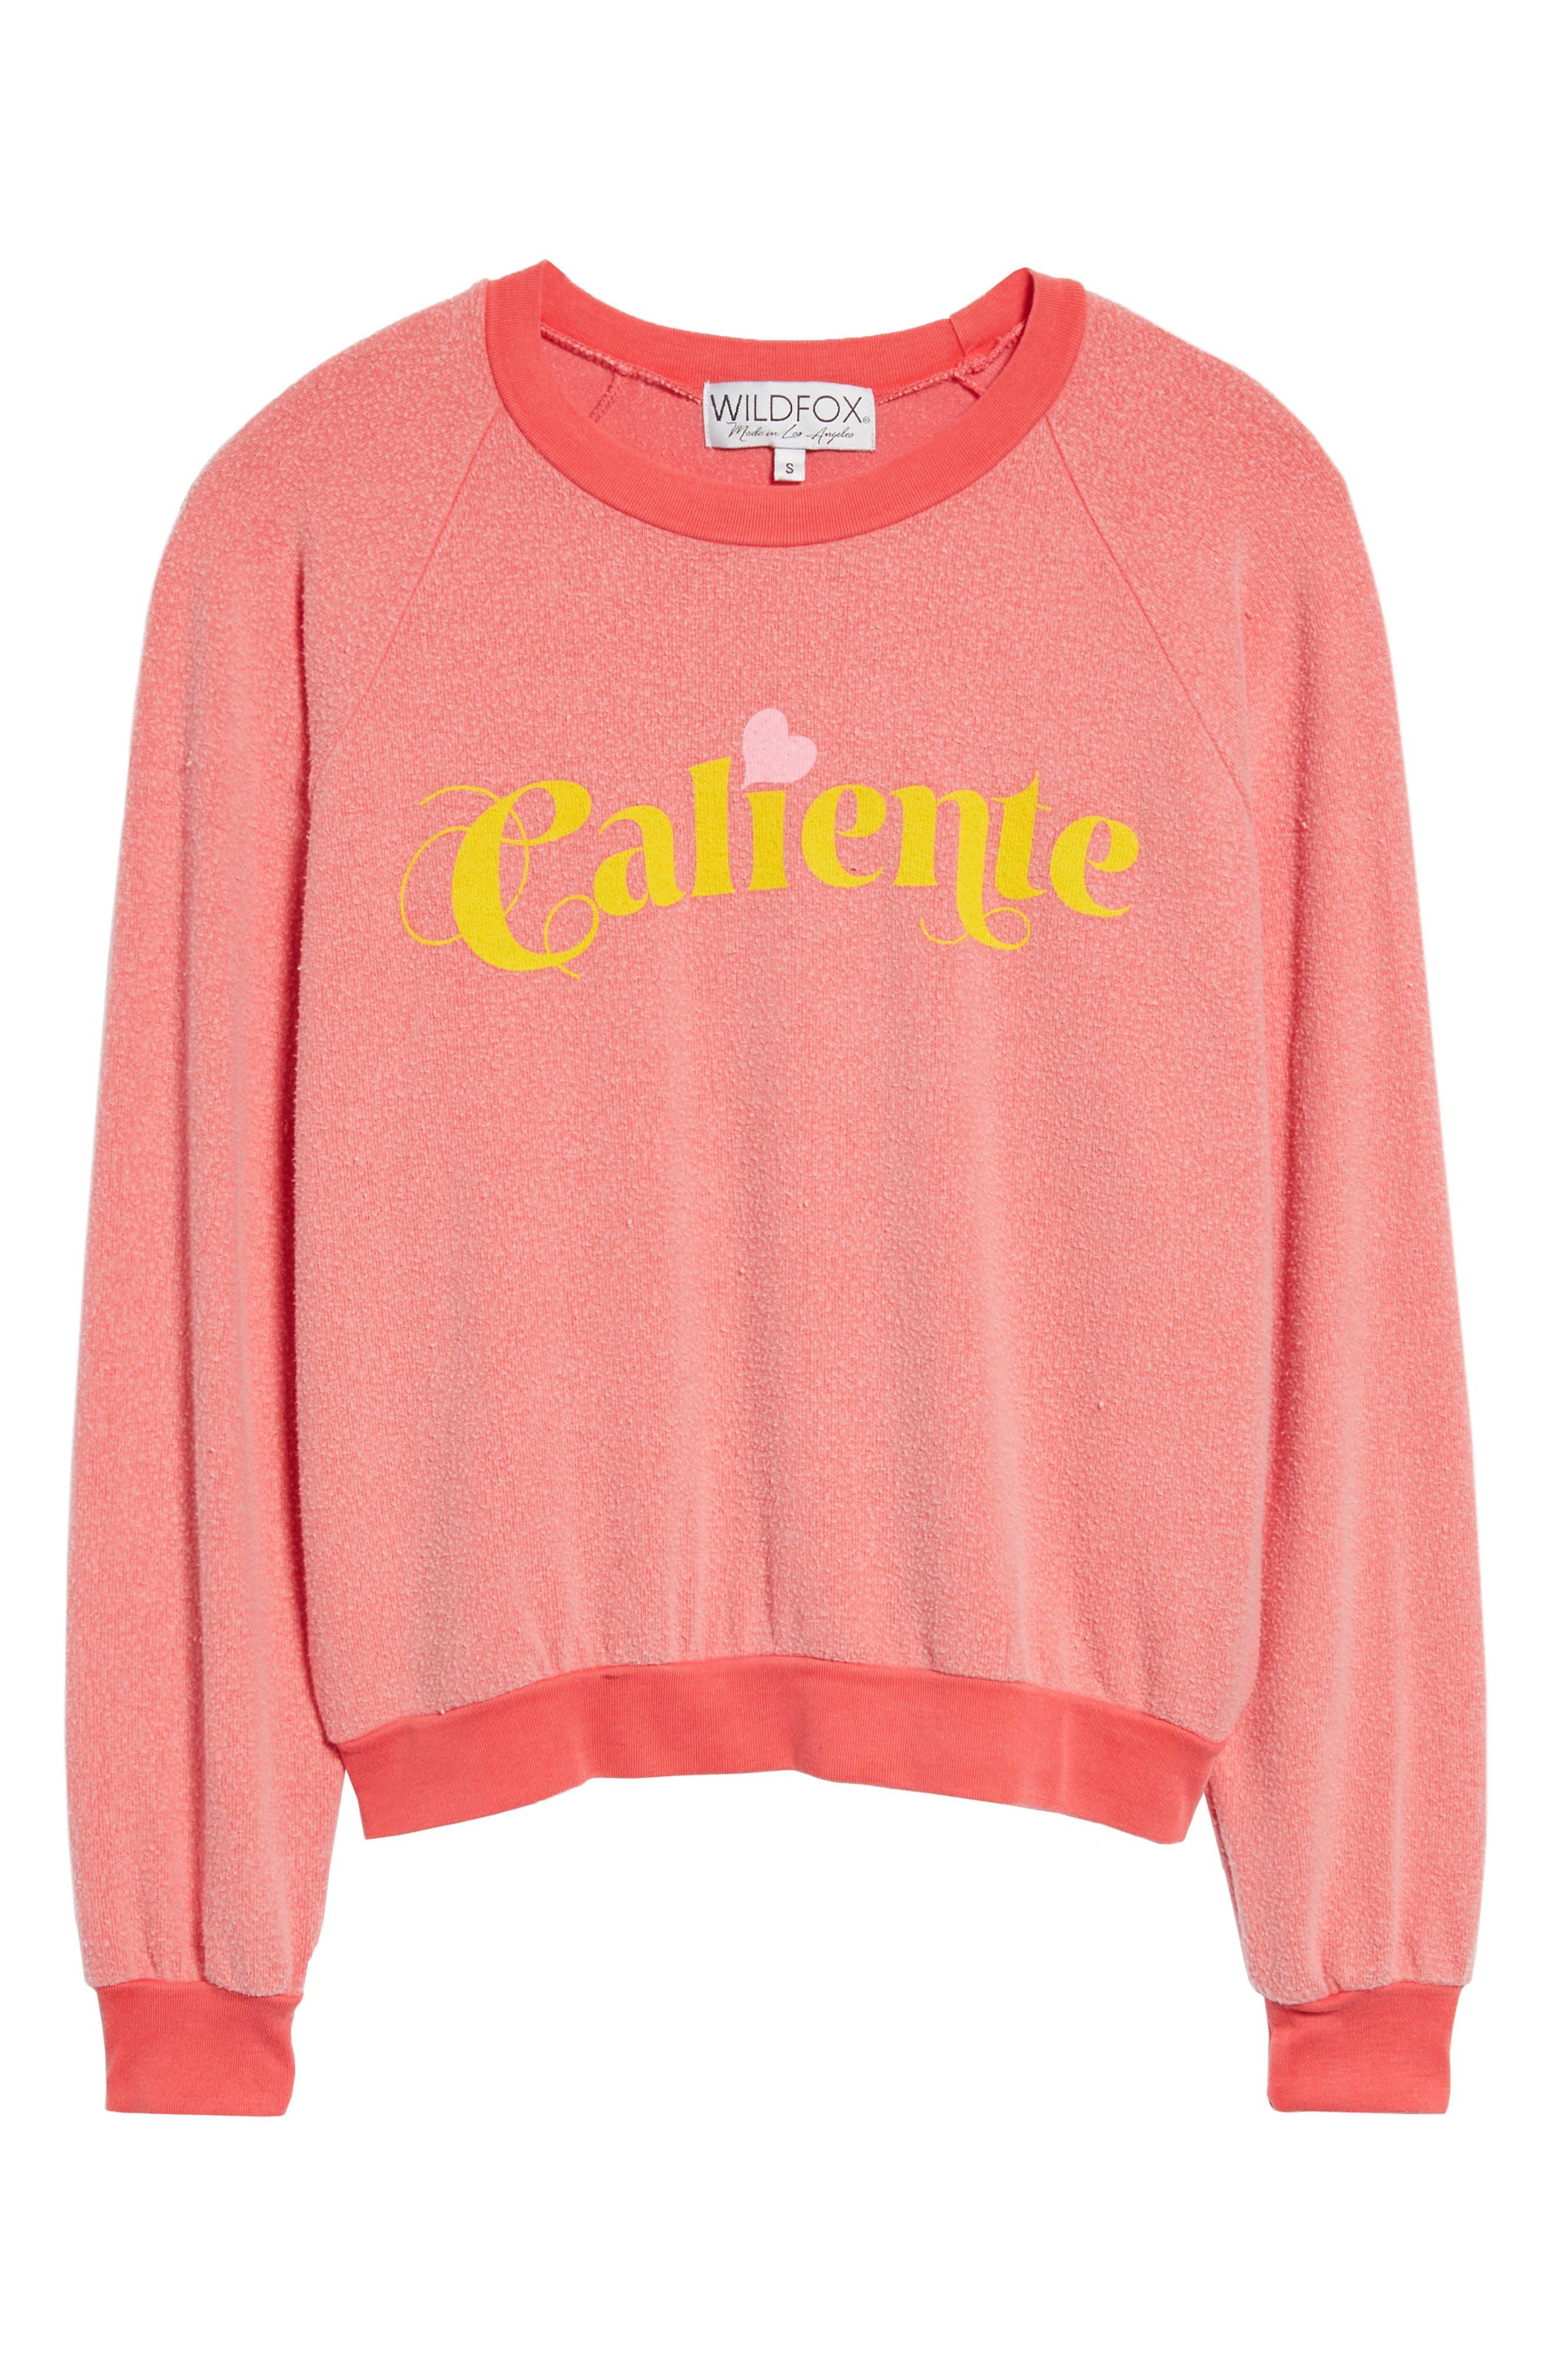 Caliente Junior Sweatshirt,                             Alternate thumbnail 6, color,                             Pigment Hot Lipstick